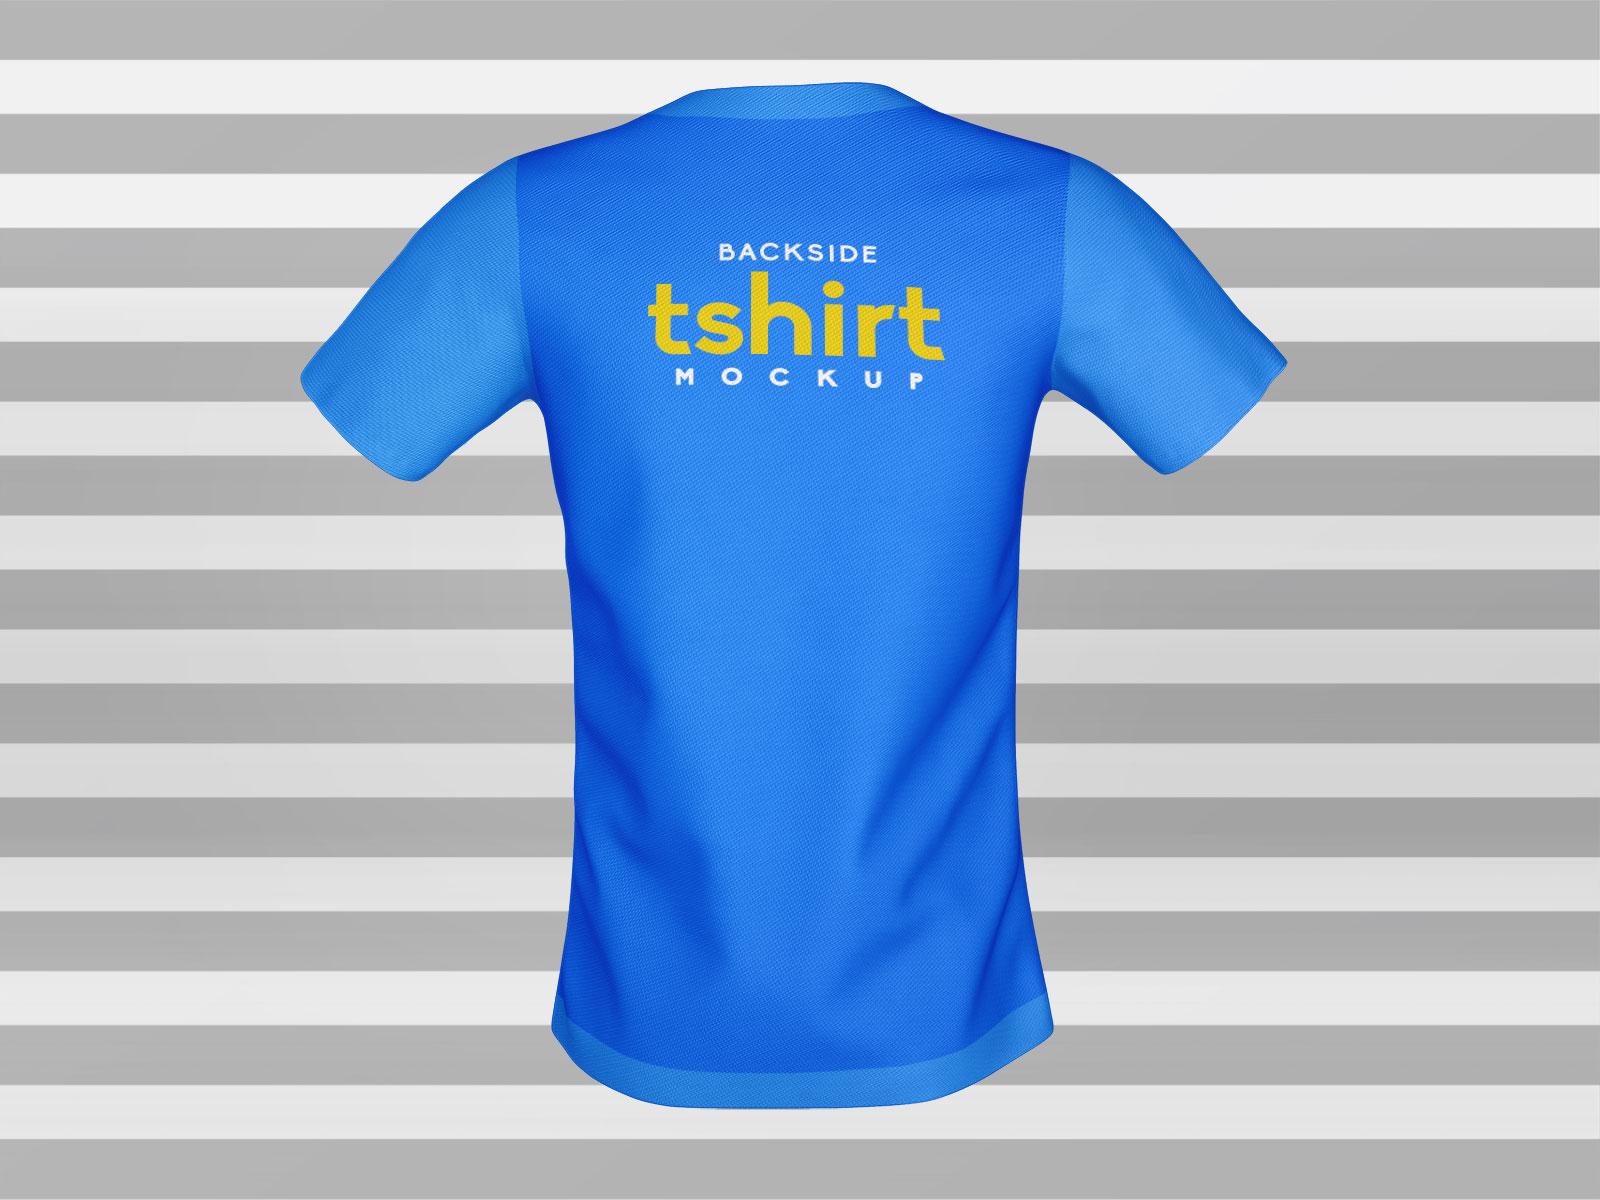 Free-3D-Rendered-Front-Back-T-Shirt-Mockup-PSD-2